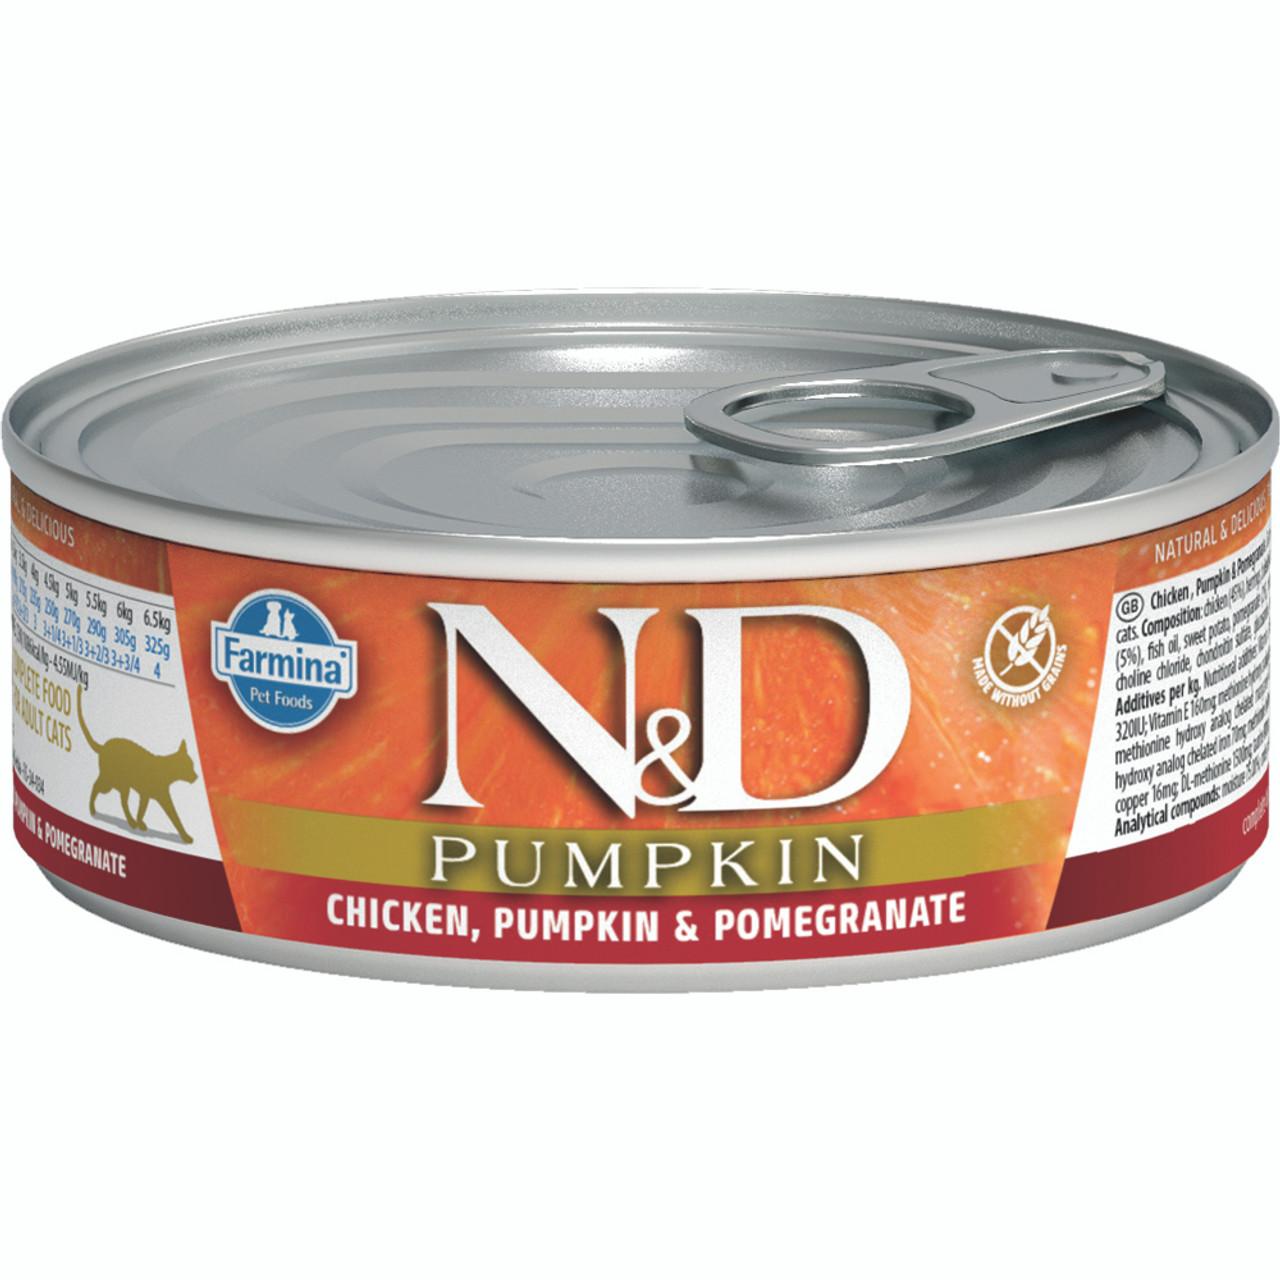 Farmina N&D Pumpkin Chicken, Pumpkin & Pomegranate Recipe Adult Canned Cat Food